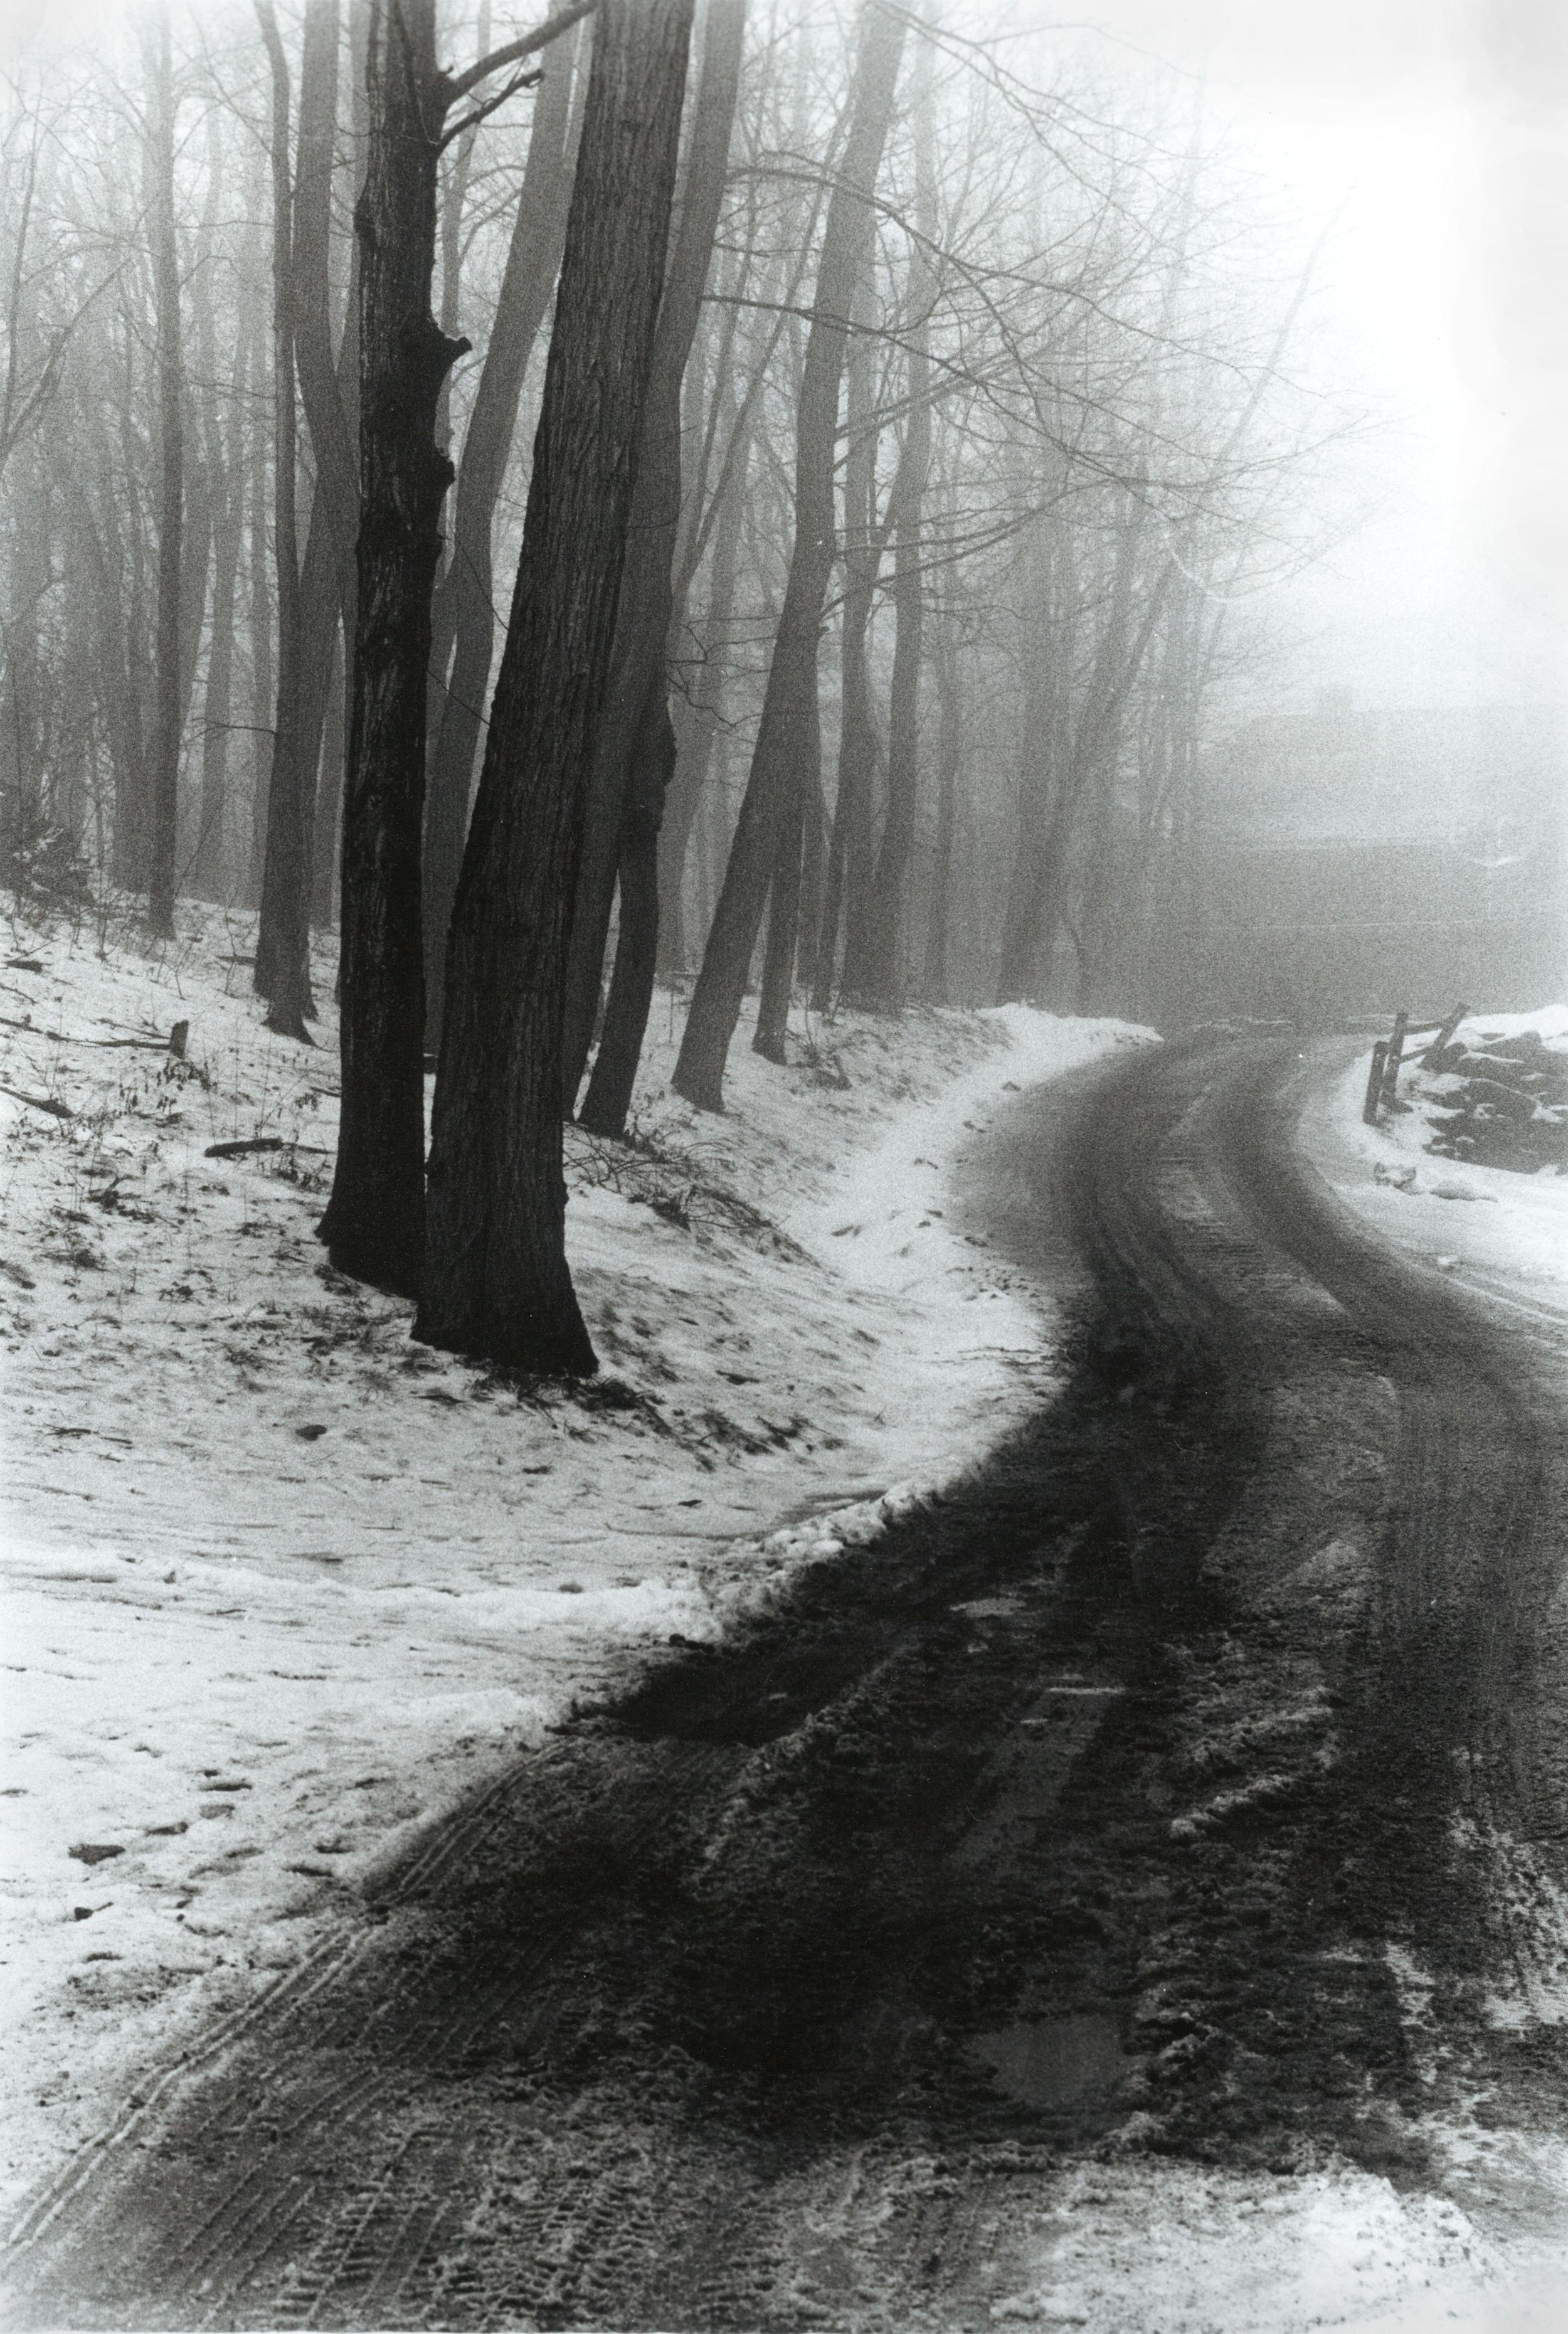 Road in the Snow .jpg